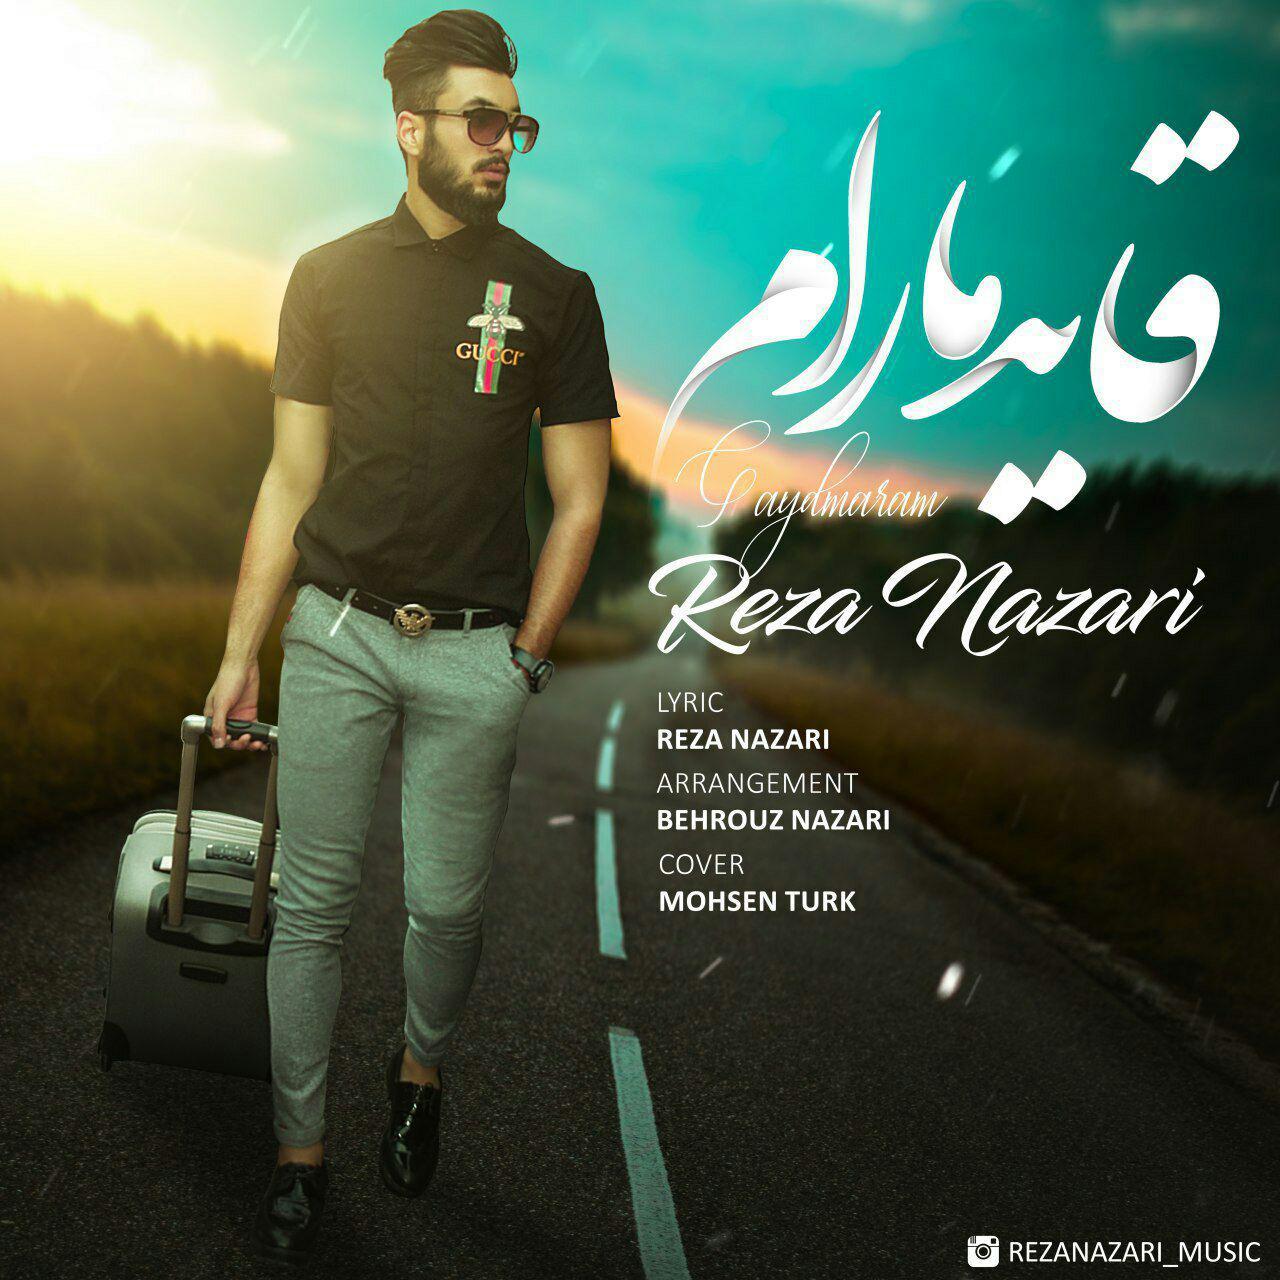 http://birtunes.ir/wp-content/uploads/2018/11/Reza-Nazari-Ghayidmaram.jpg